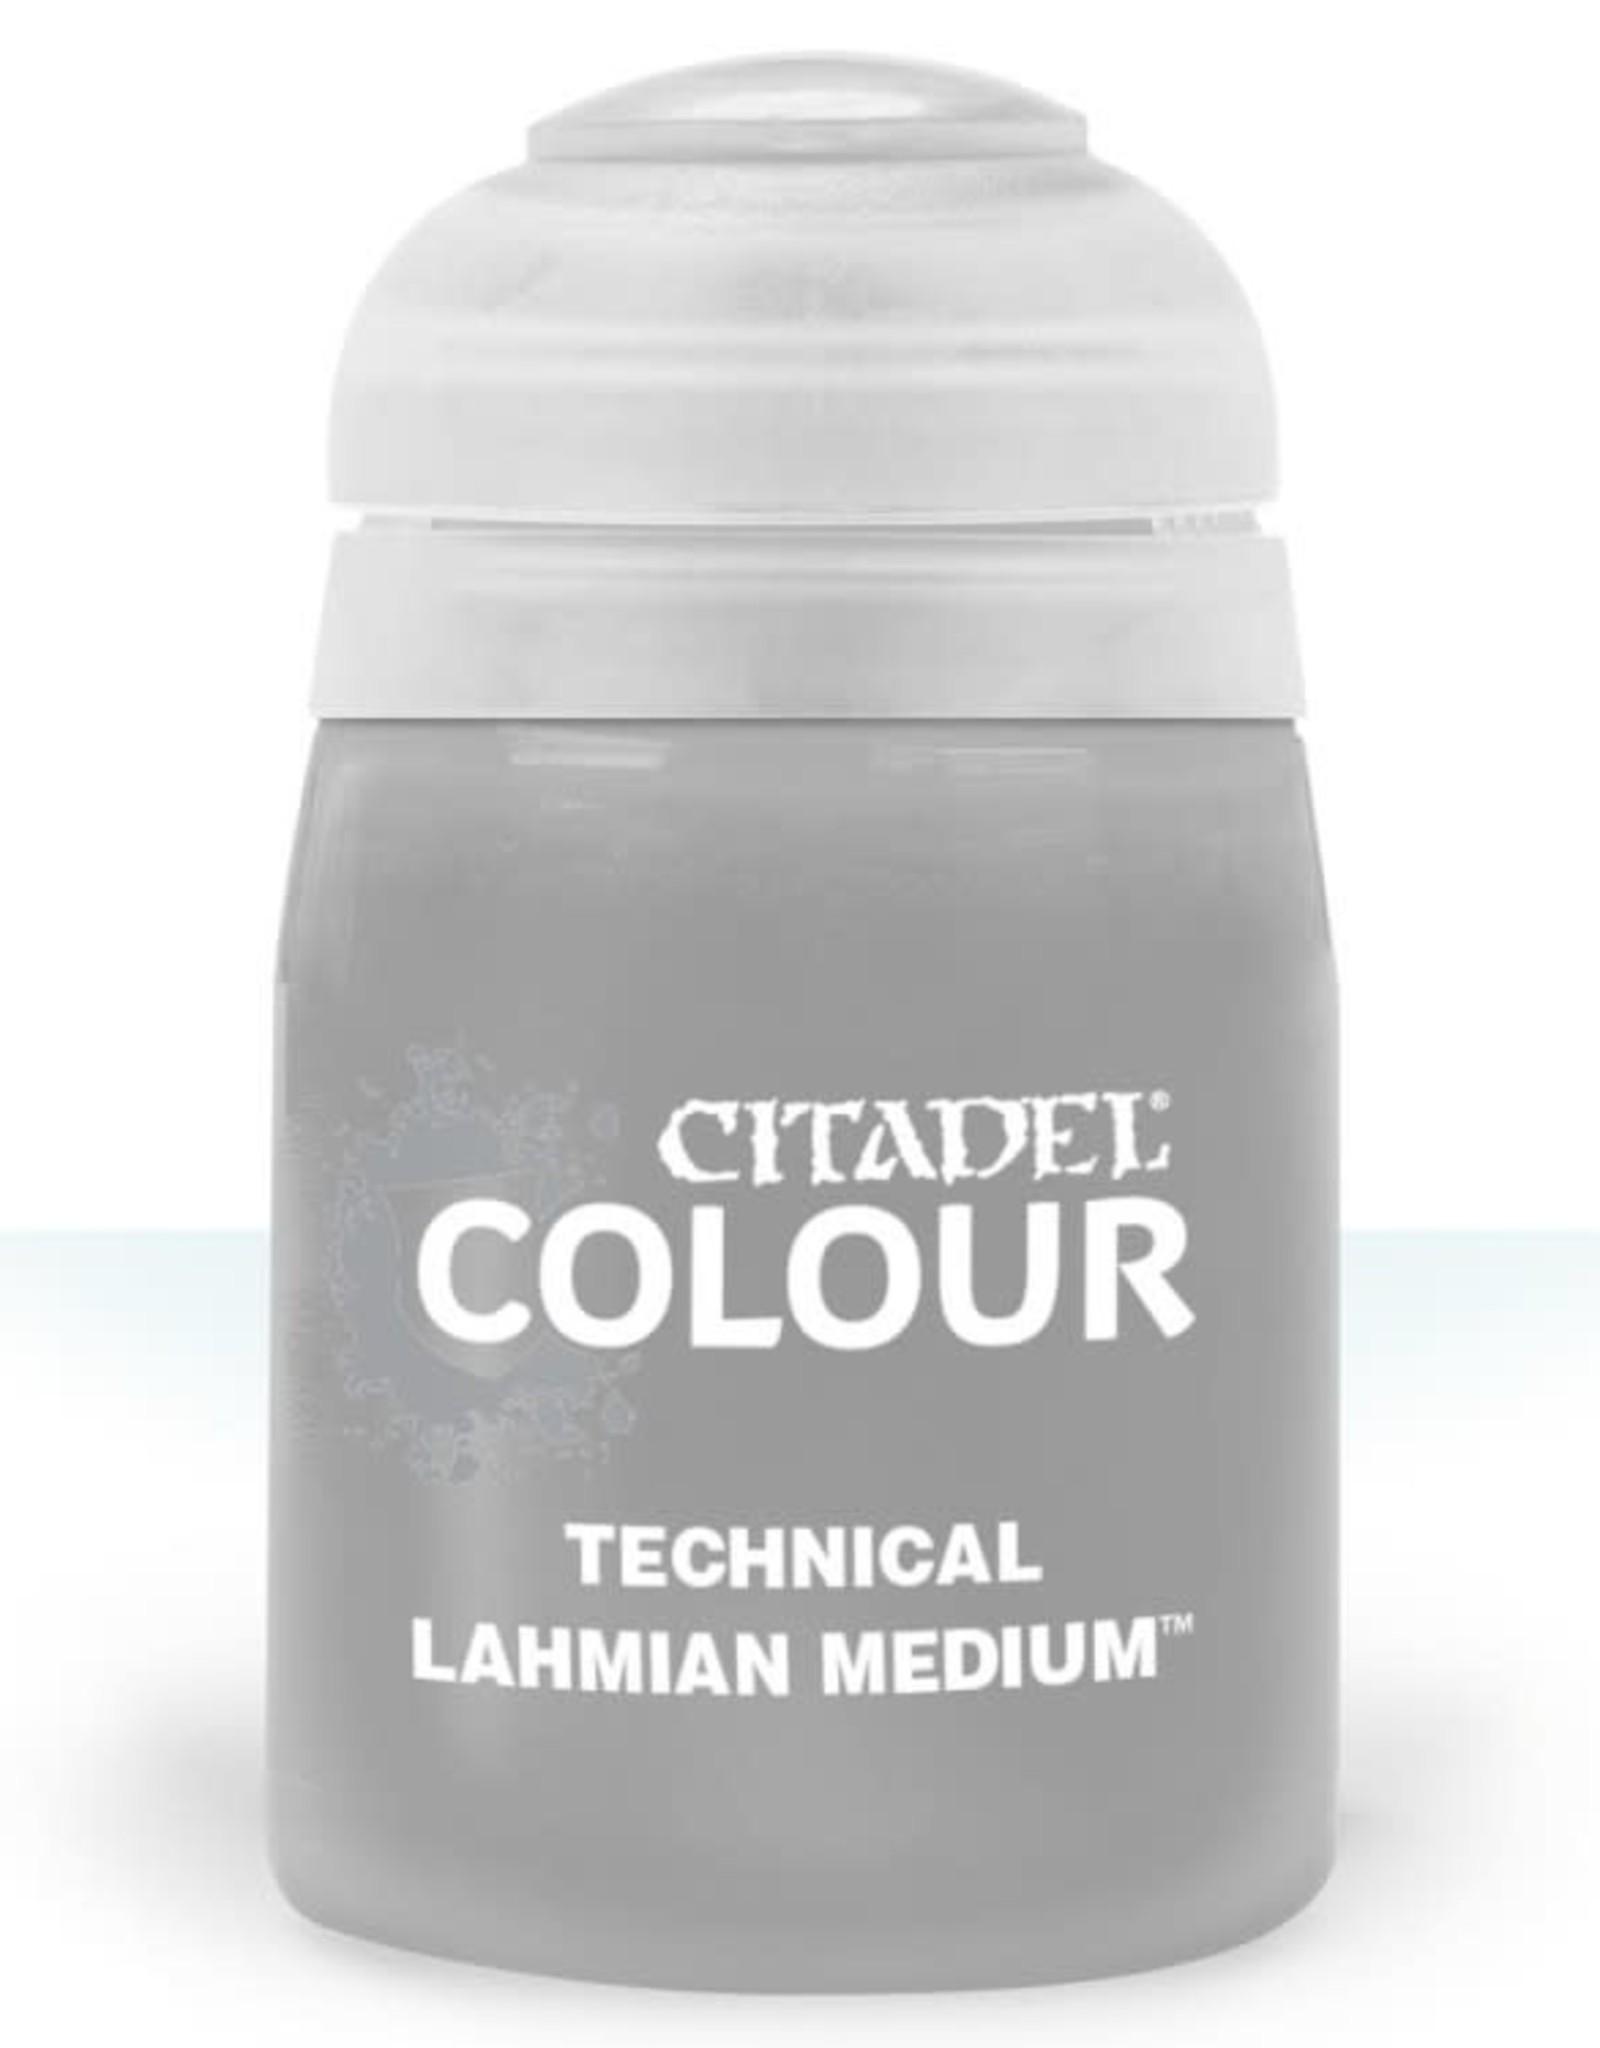 Games Workshop Citadel Paint: Technical - Lahmian Medium